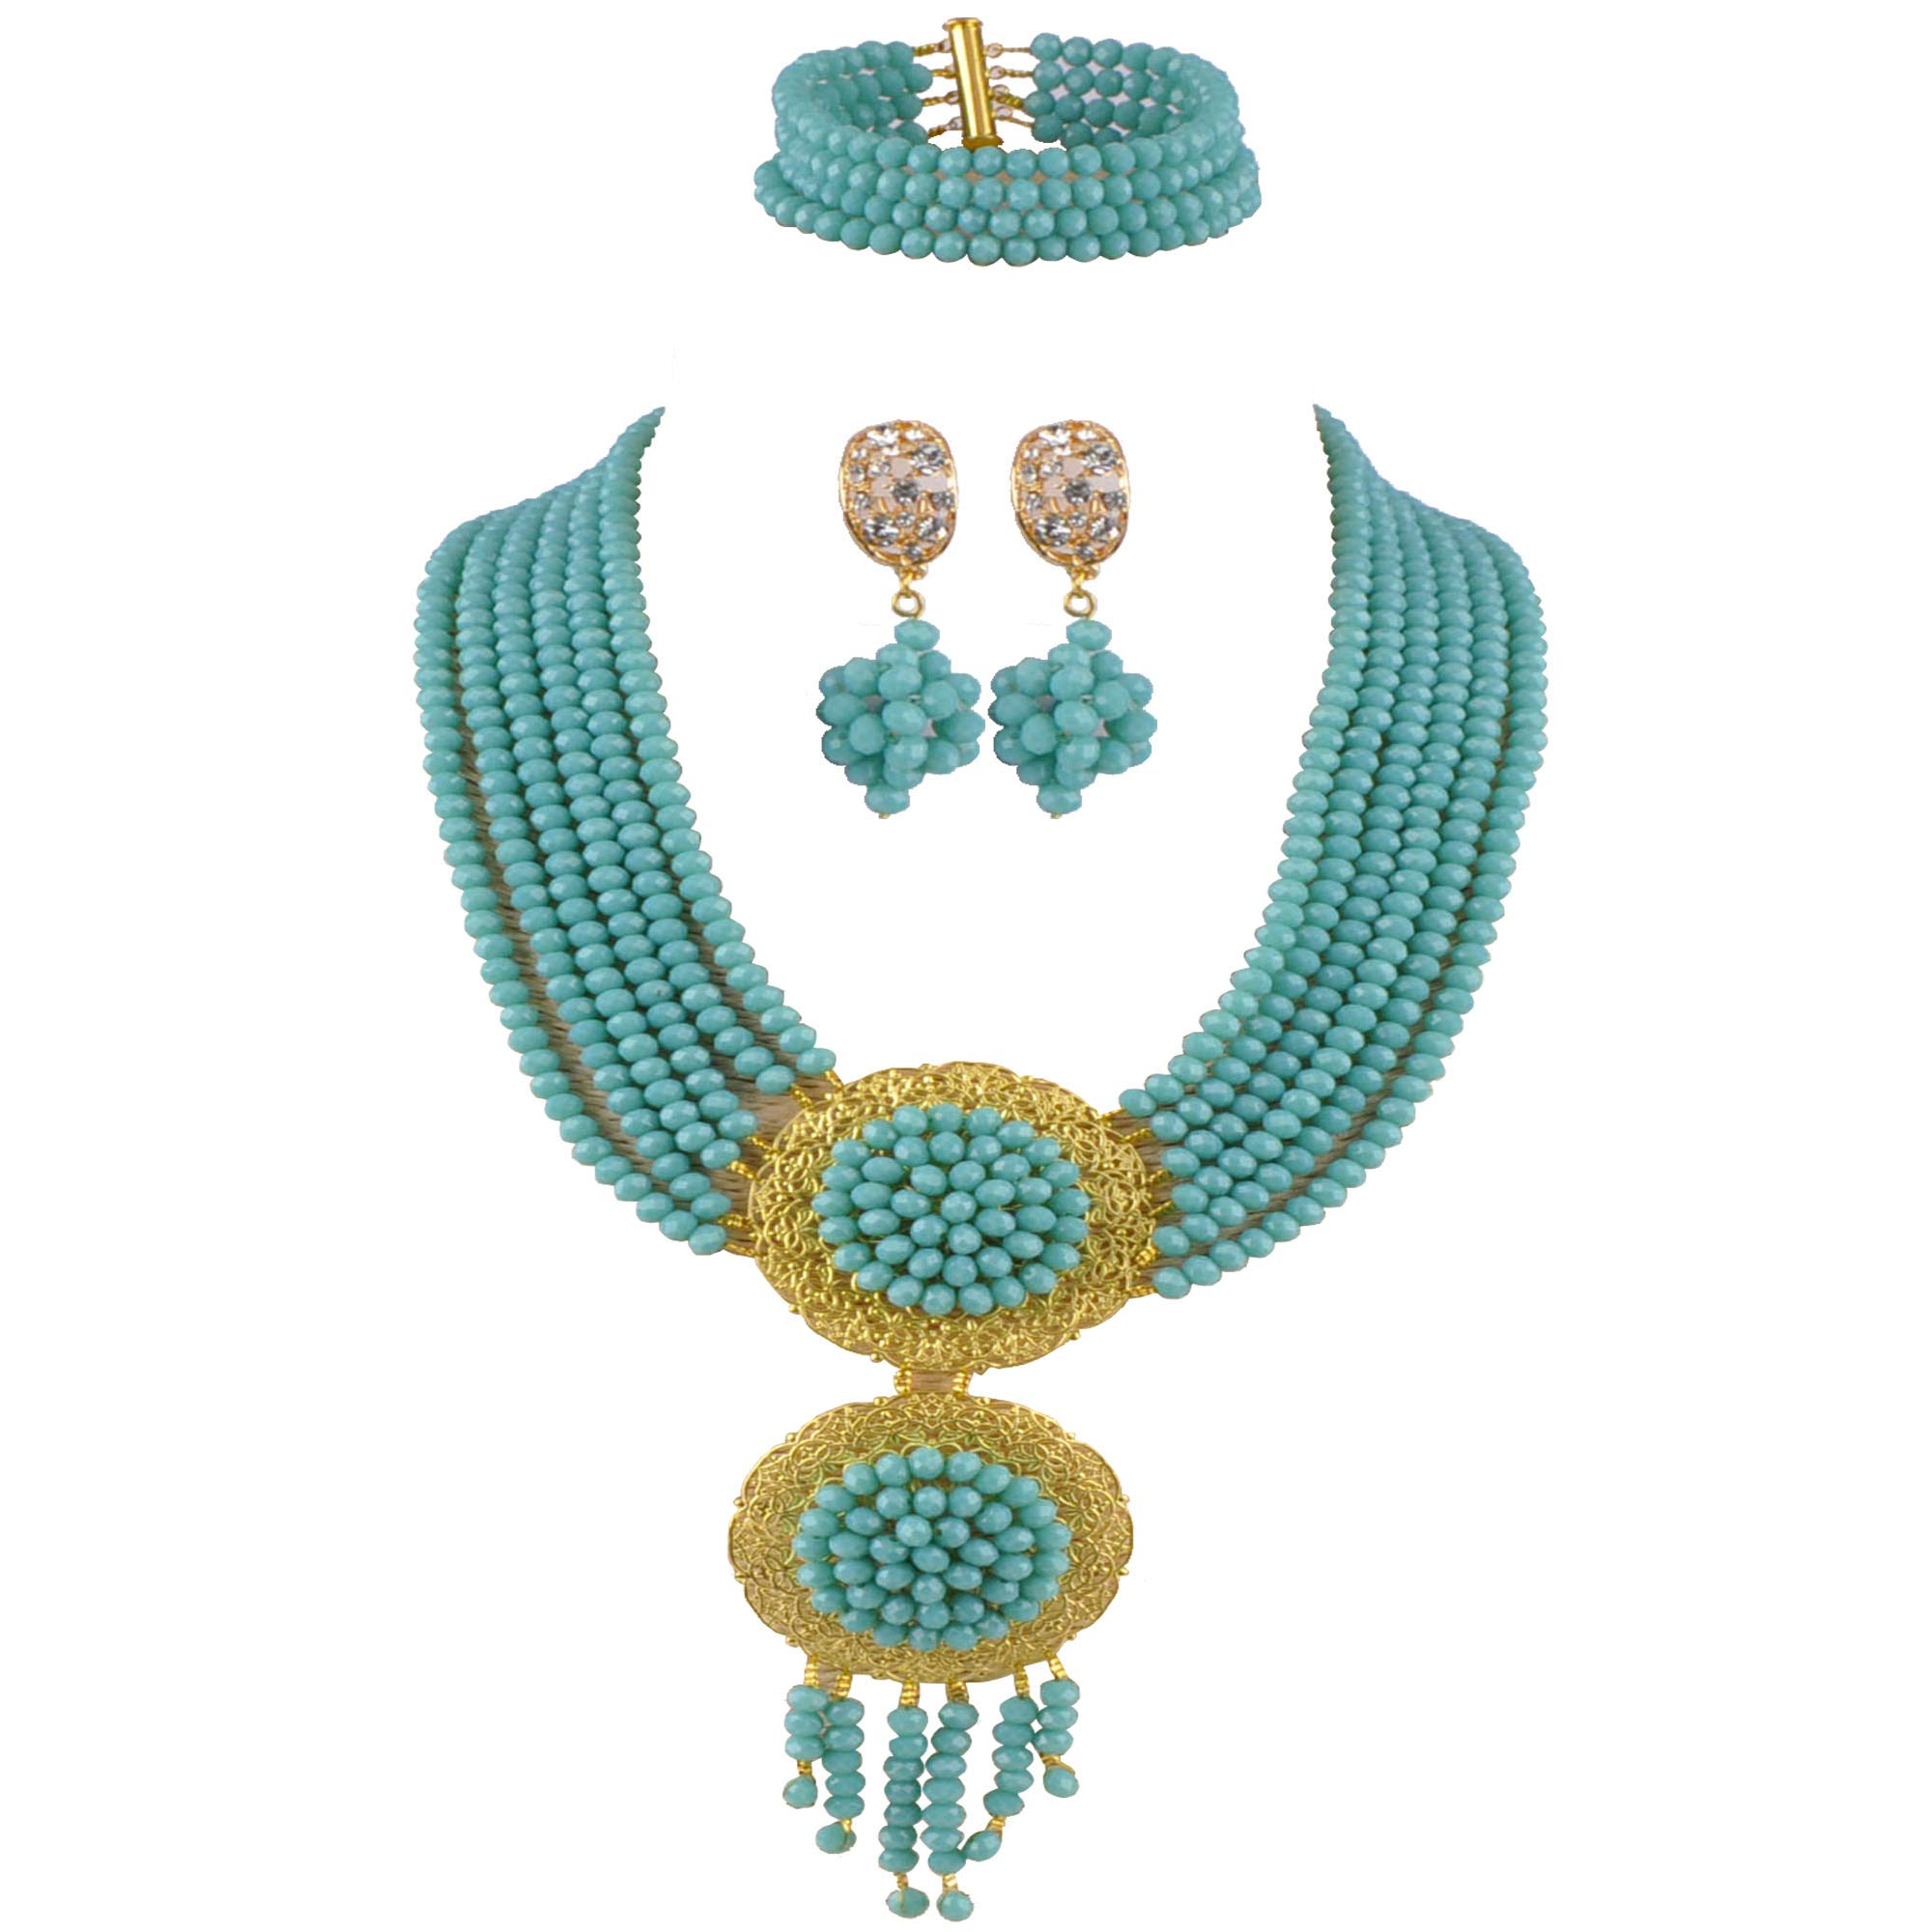 aczuv Crystal Beaded African Beads Jewelry Set 2017 Nigerian Wedding Bridal Party Jewelry Sets